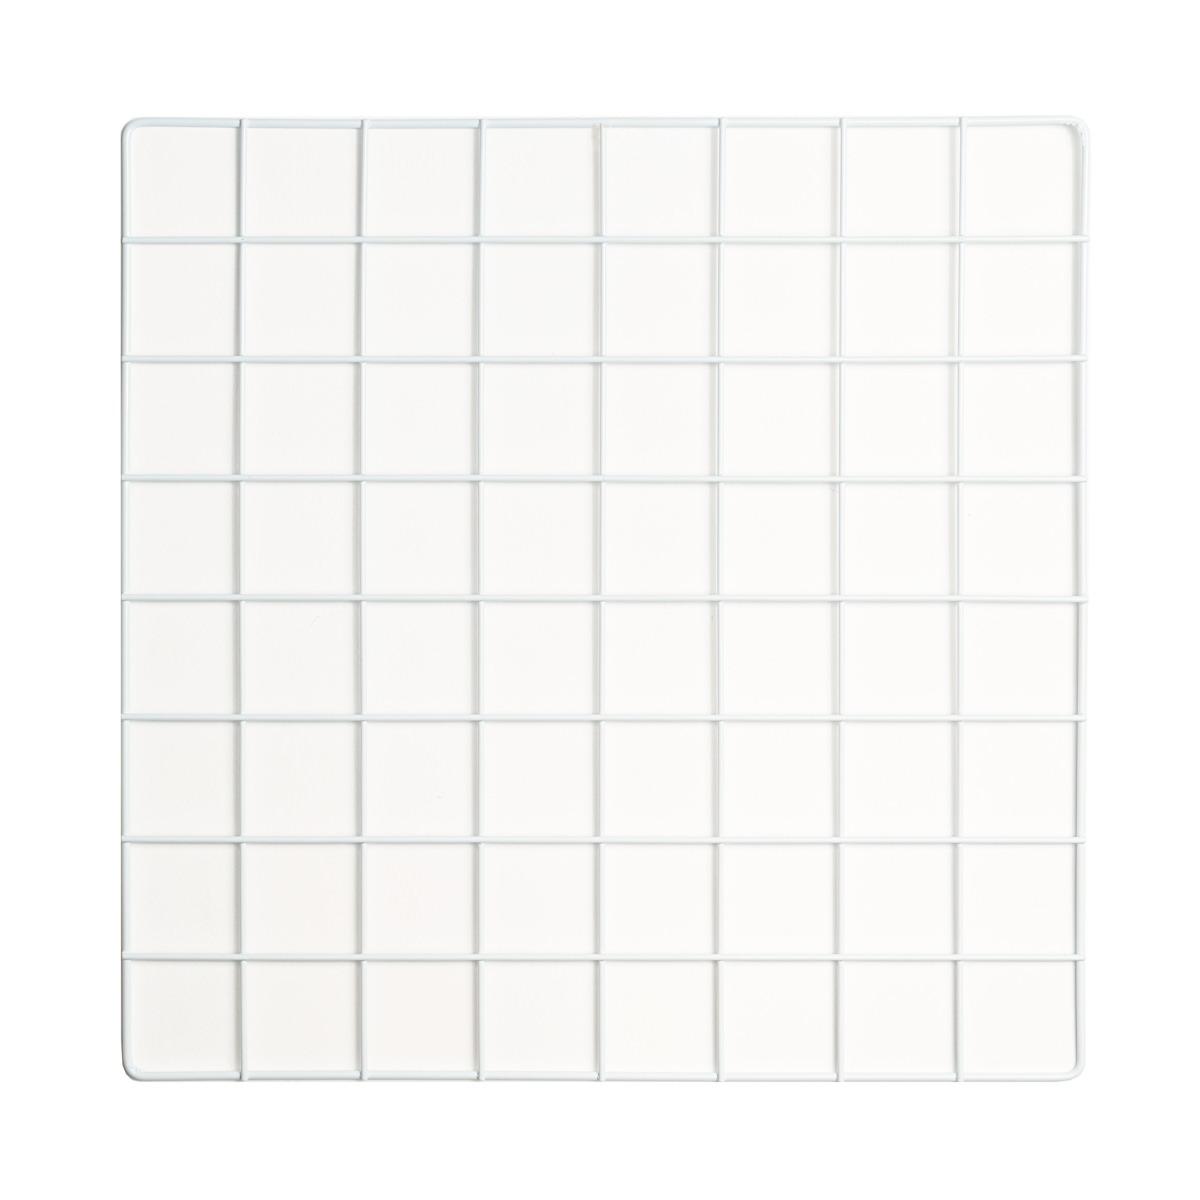 Aramado memory board clássico pequeno. cores: rose/ preto e branco